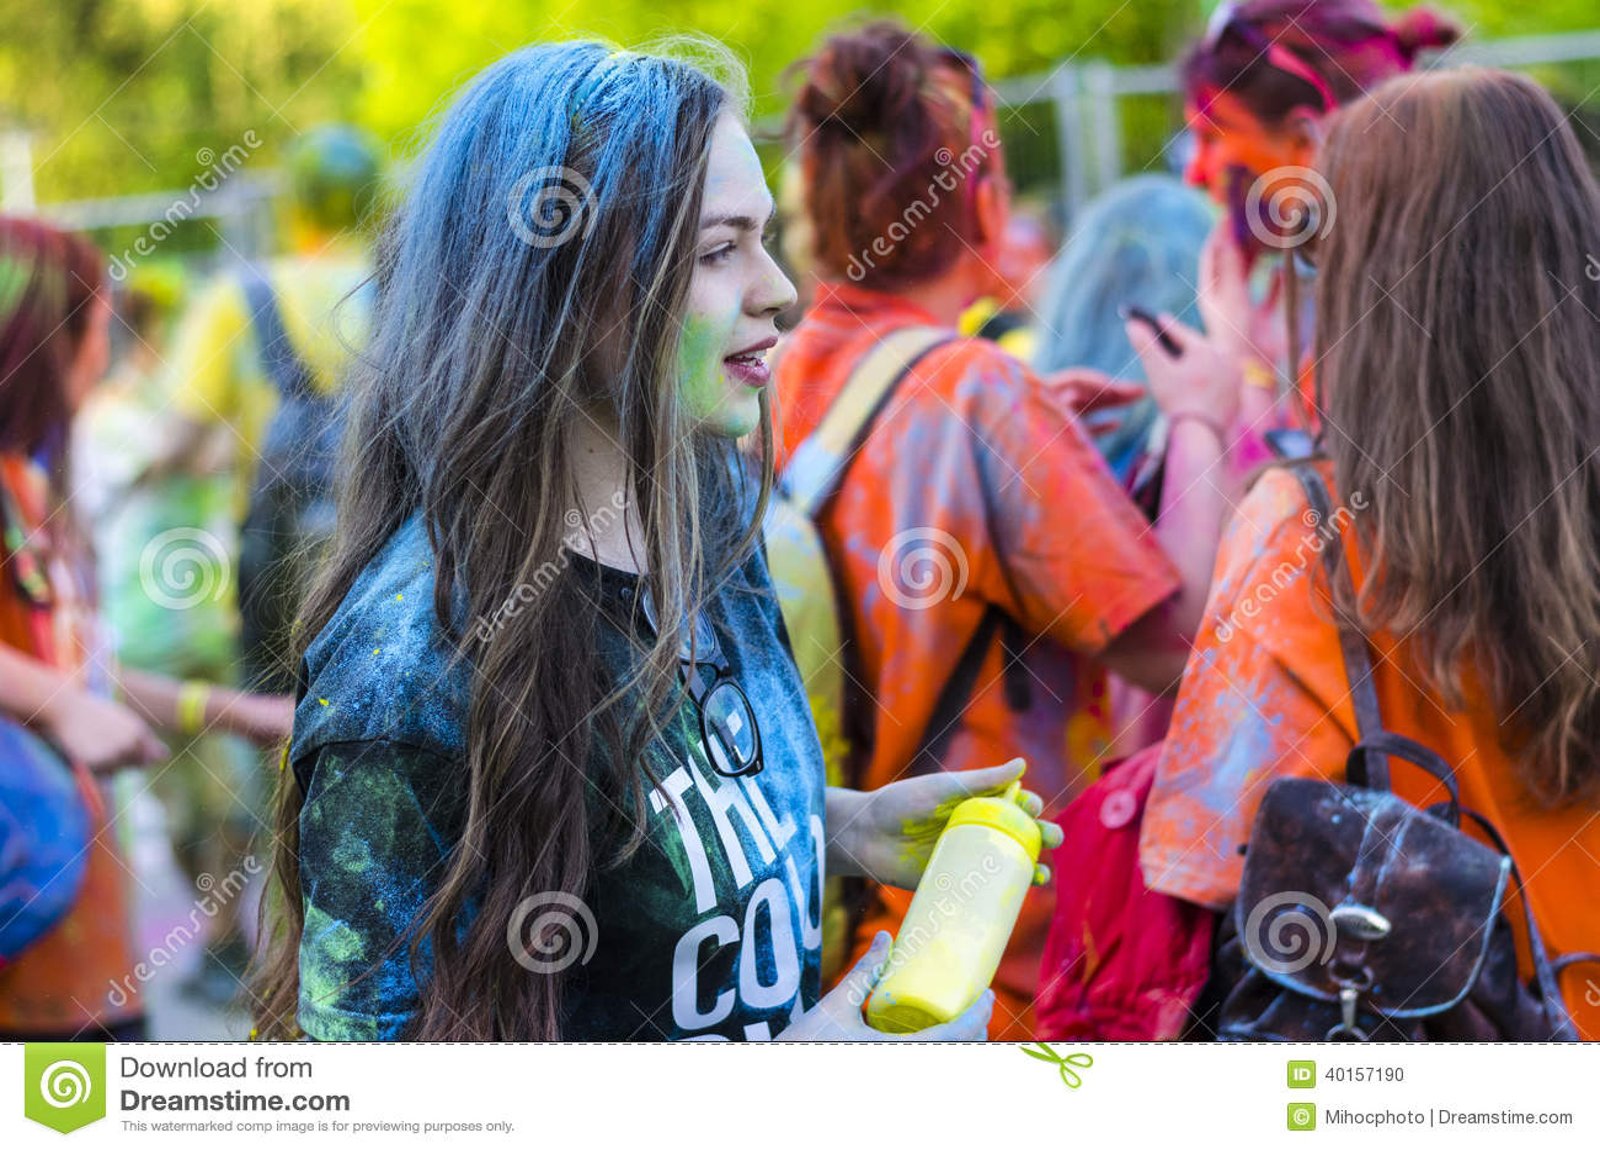 Girl draped in blue powder at Color Run